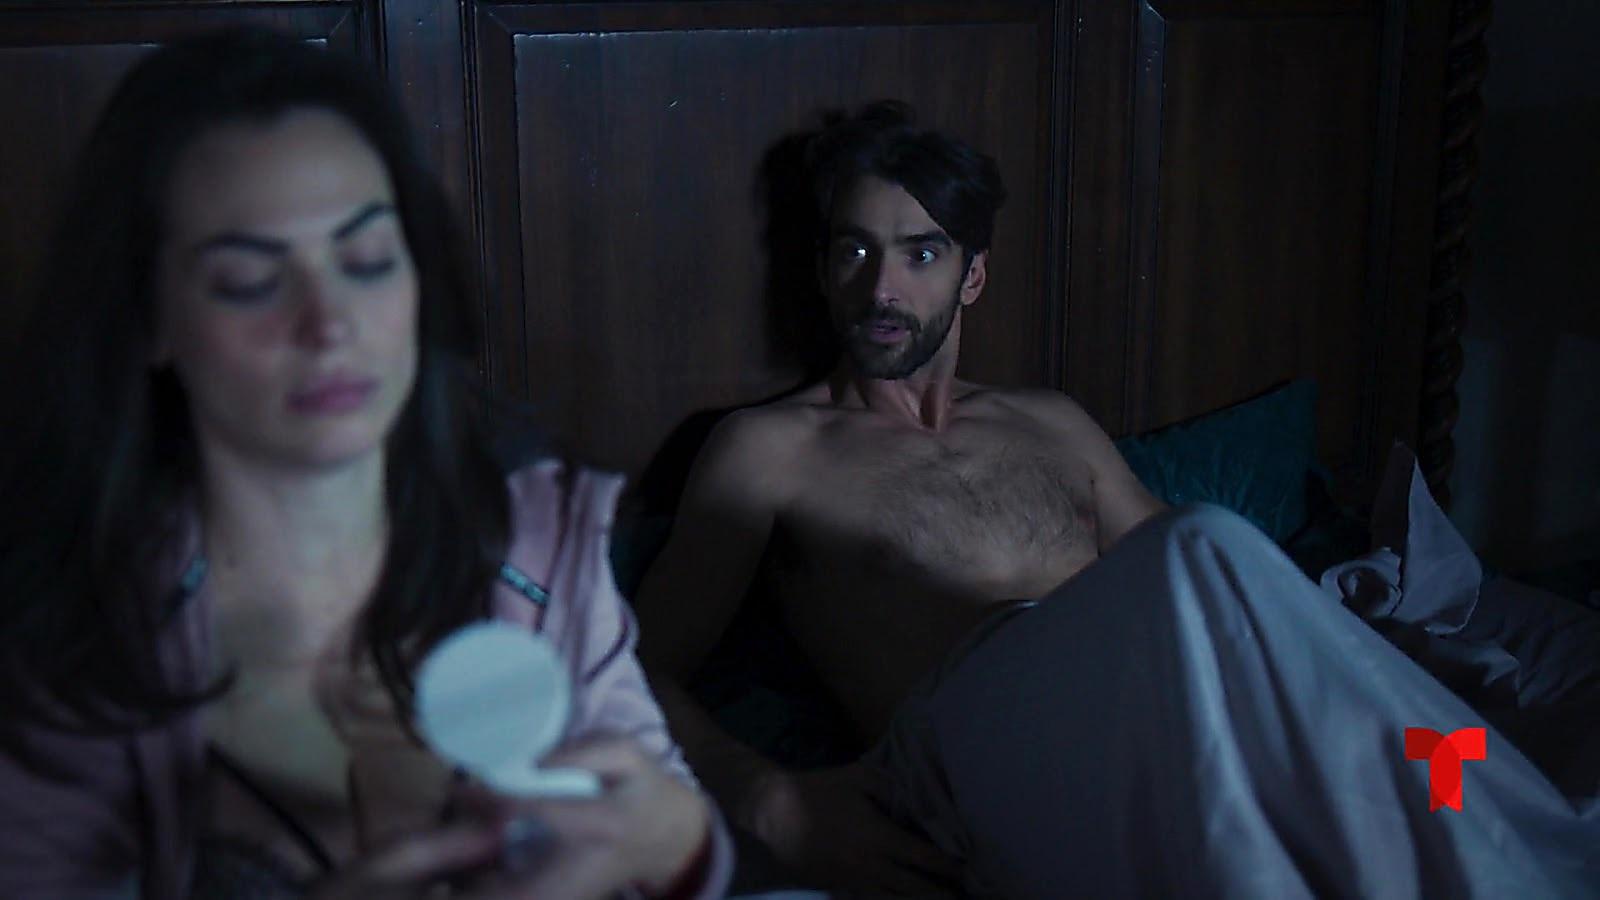 Aitor Luna sexy shirtless scene July 3, 2020, 7am